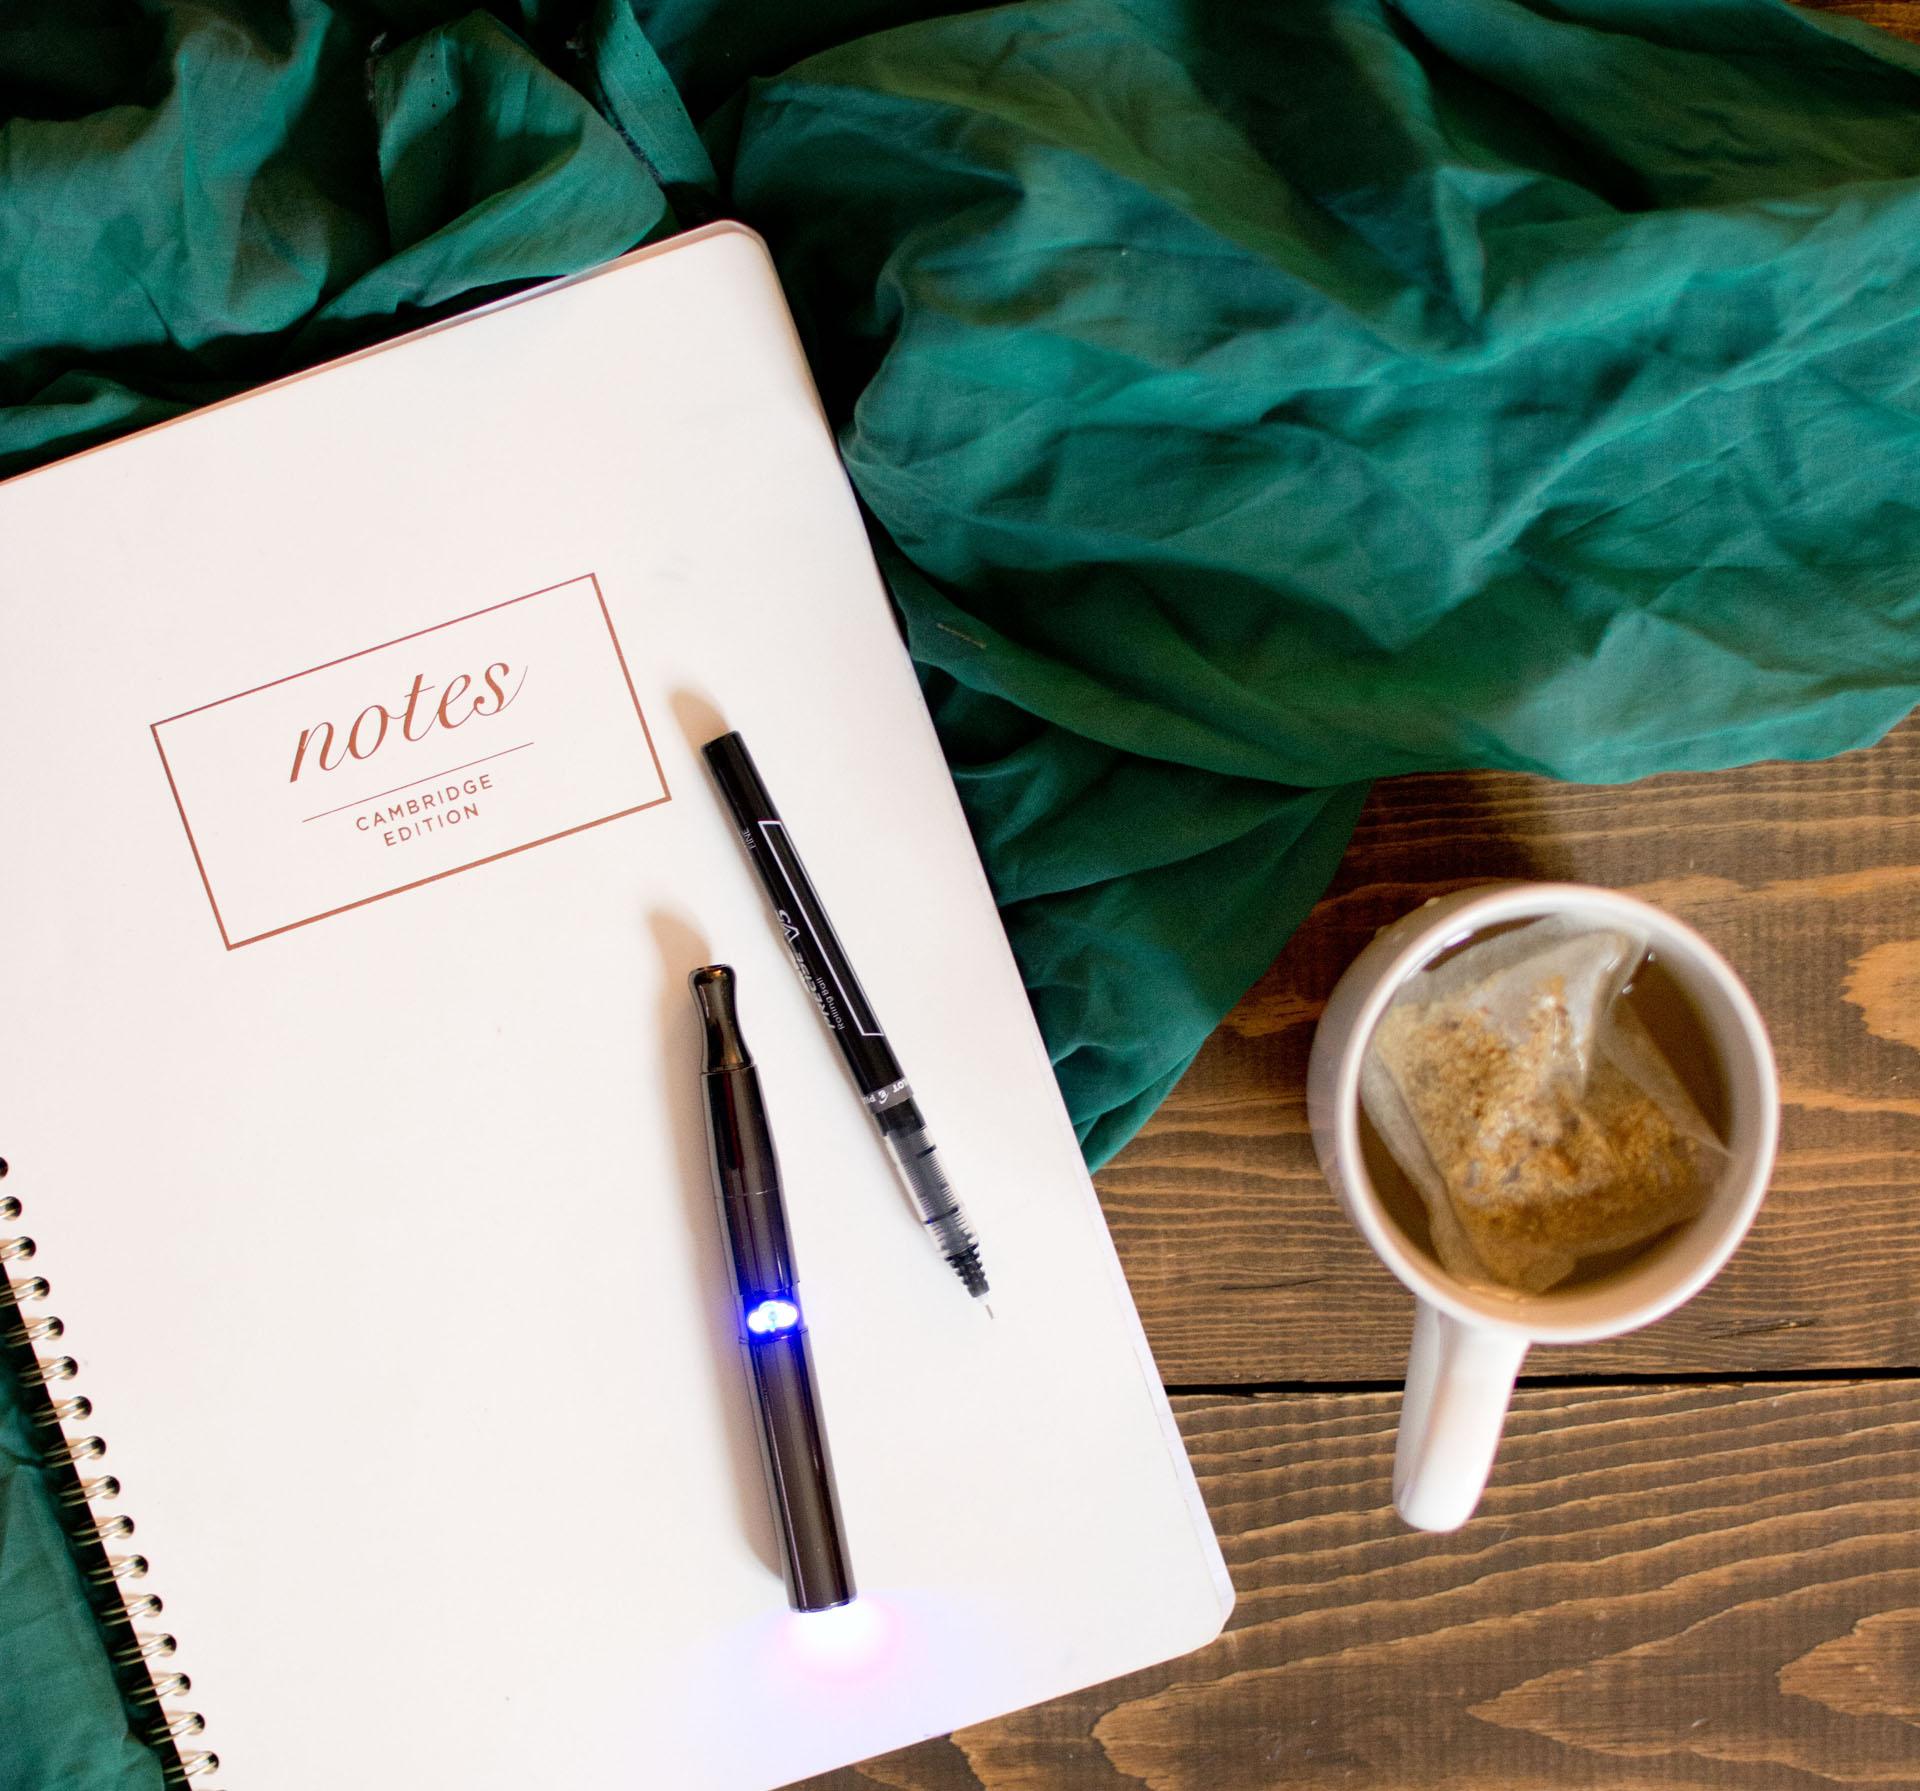 puffco-notes.jpg